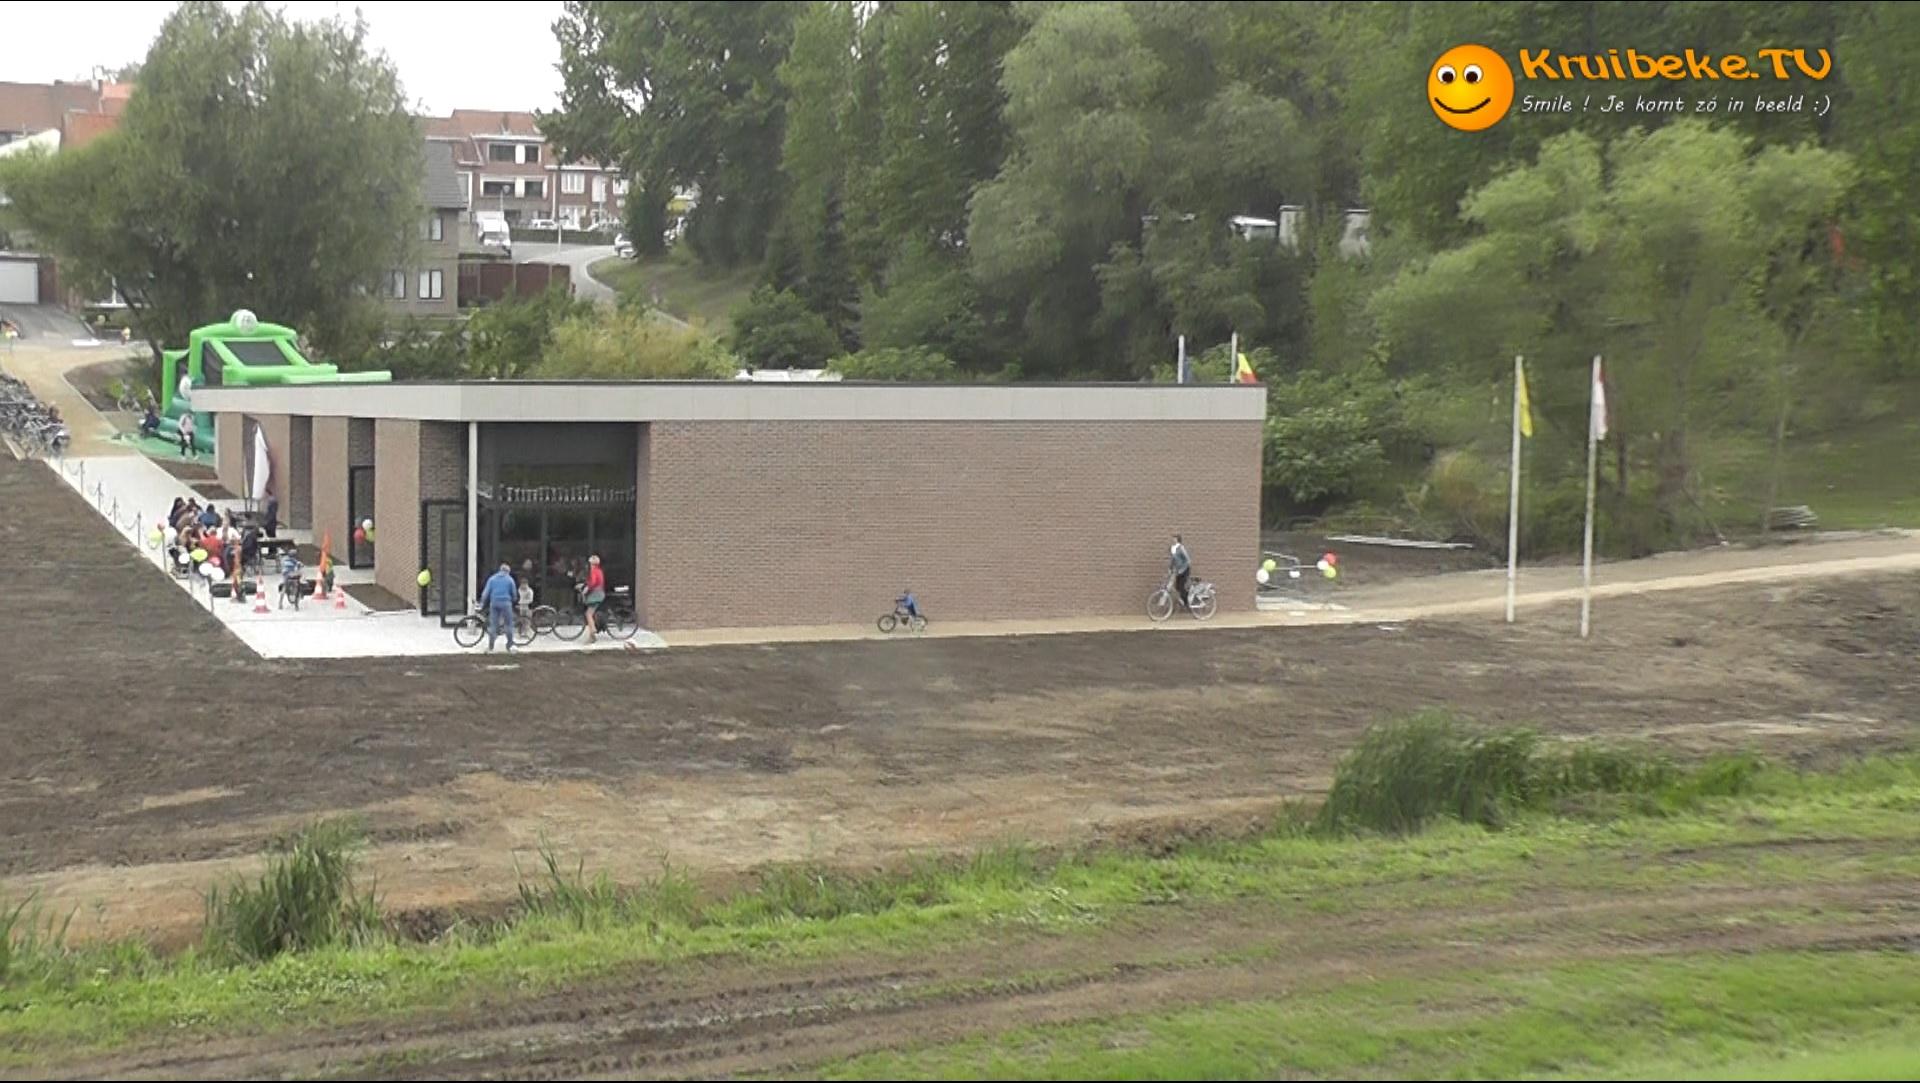 KLJ Kruibeke opent nieuw lokaal